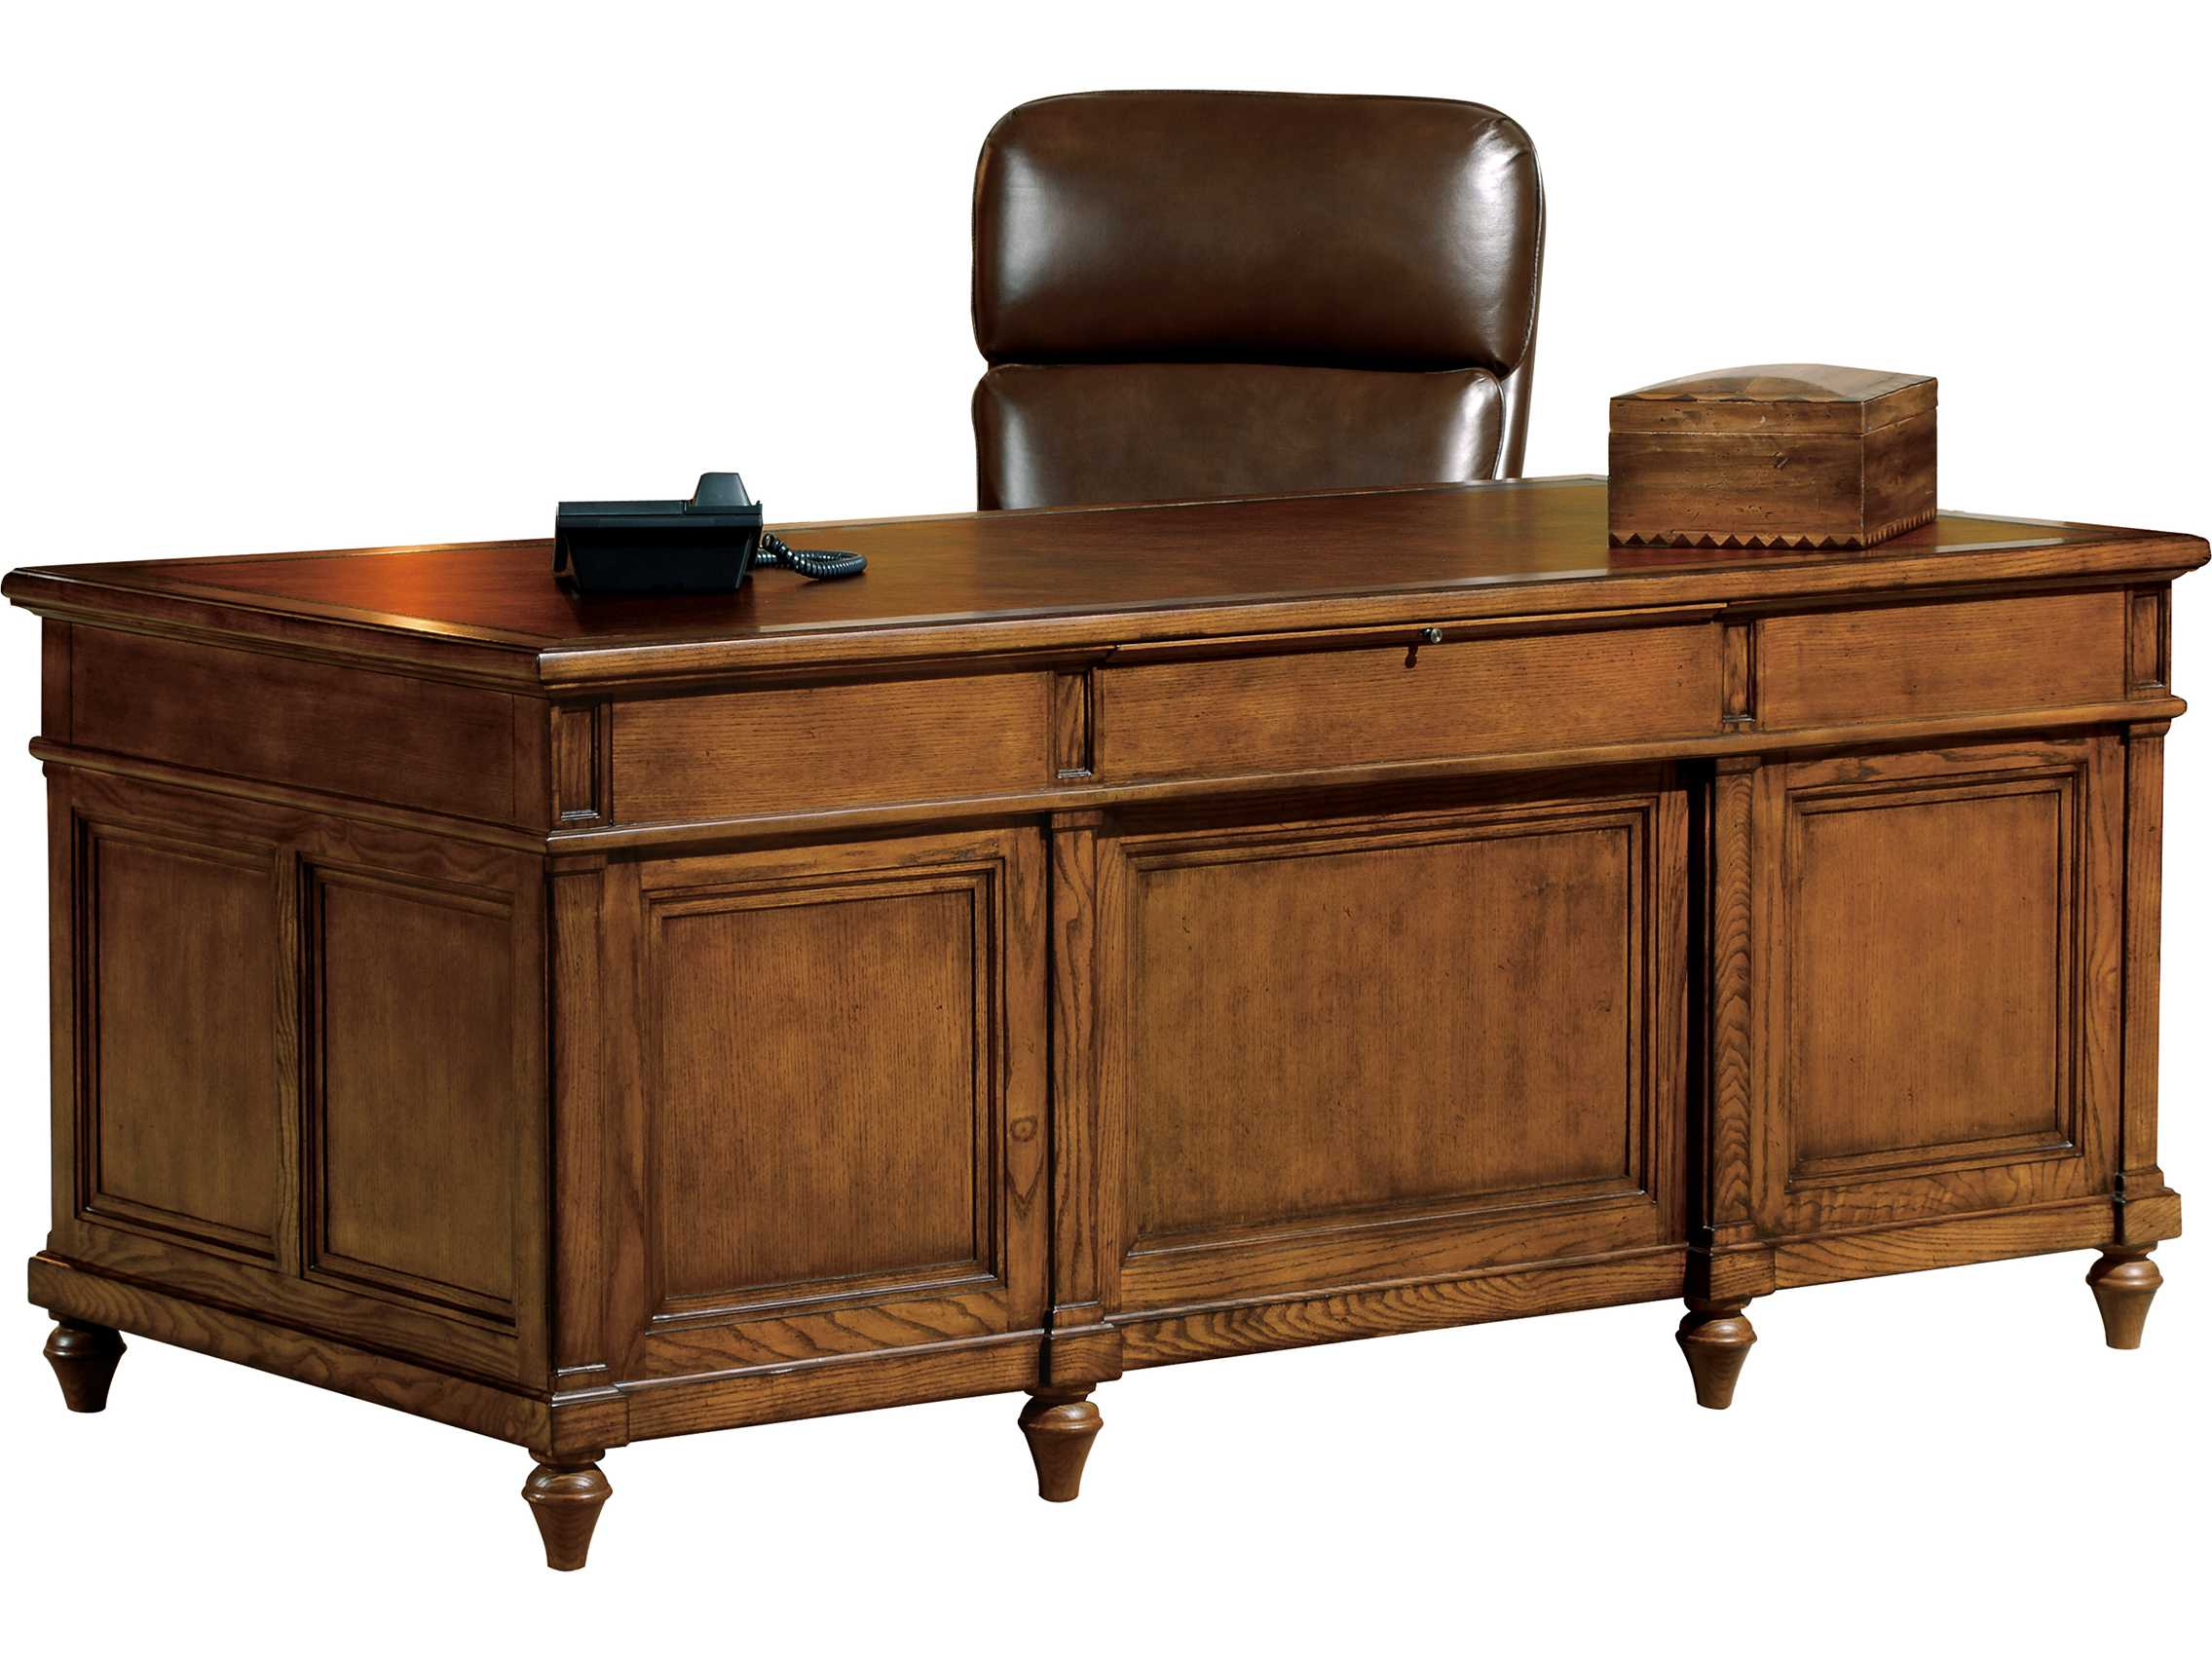 hekman office 72 x 36 executive desk in urban ash burl